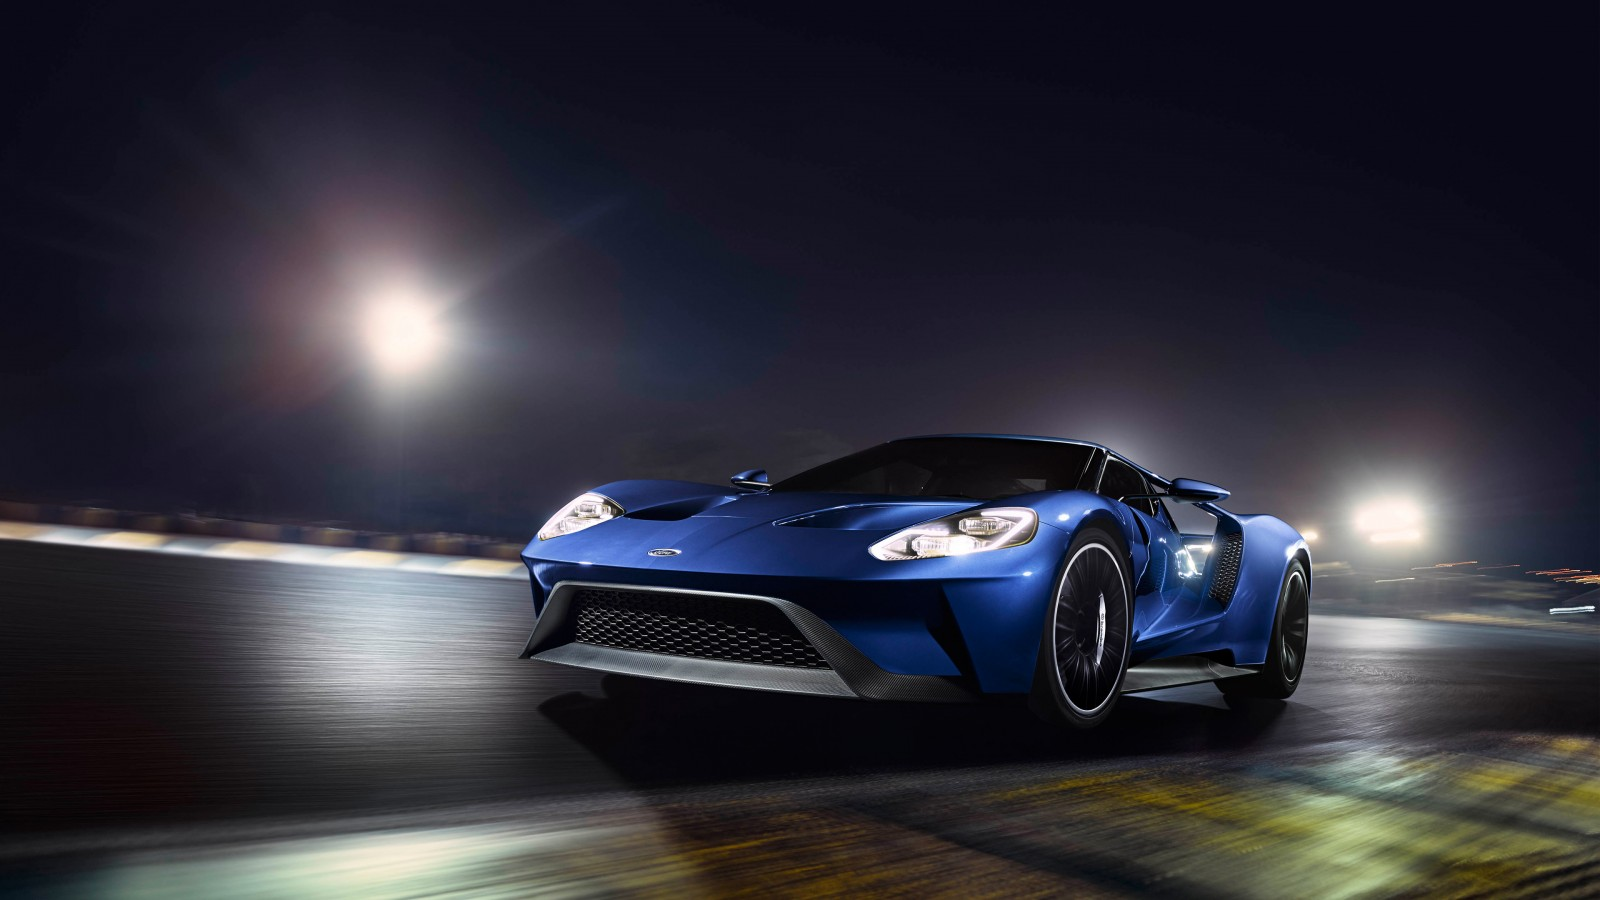 2017 Ford GT HD Wallpaper | HD Car Wallpapers